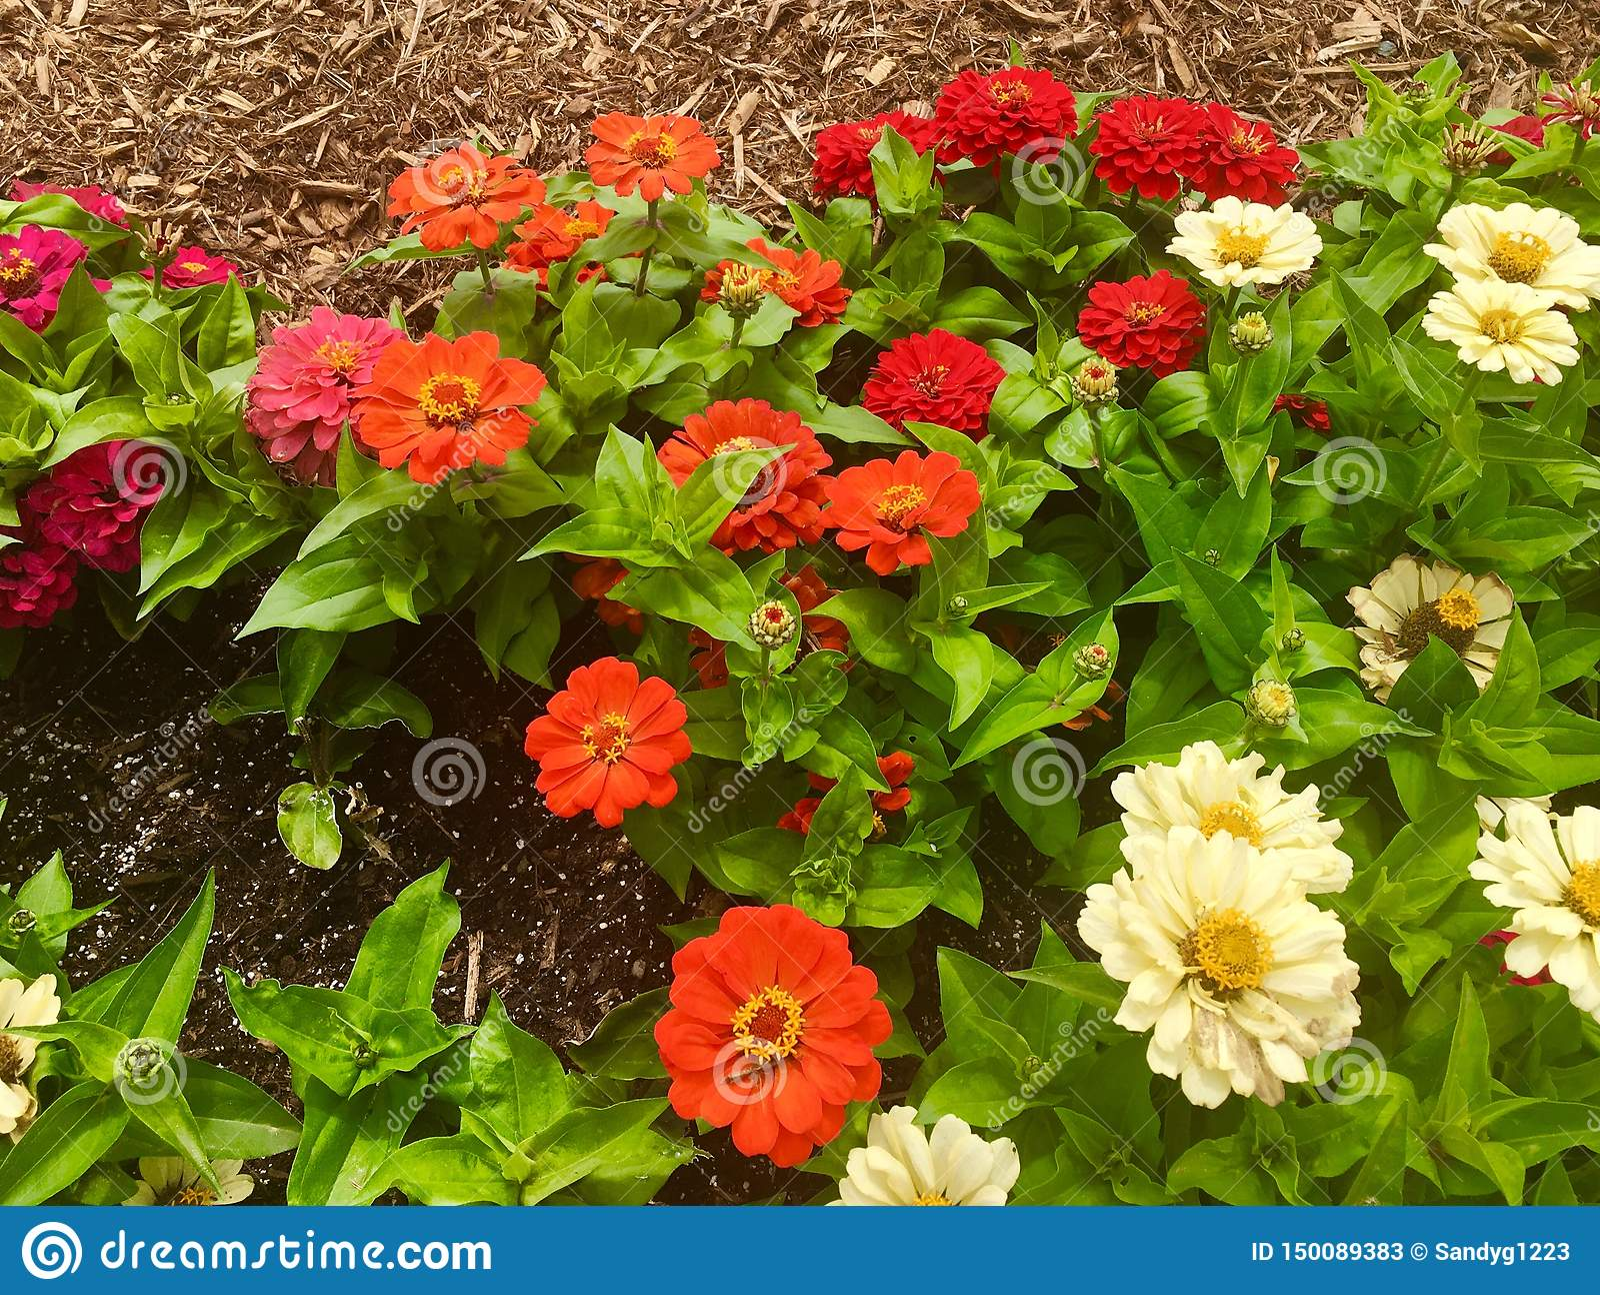 Orange, Red, and White Zinnias